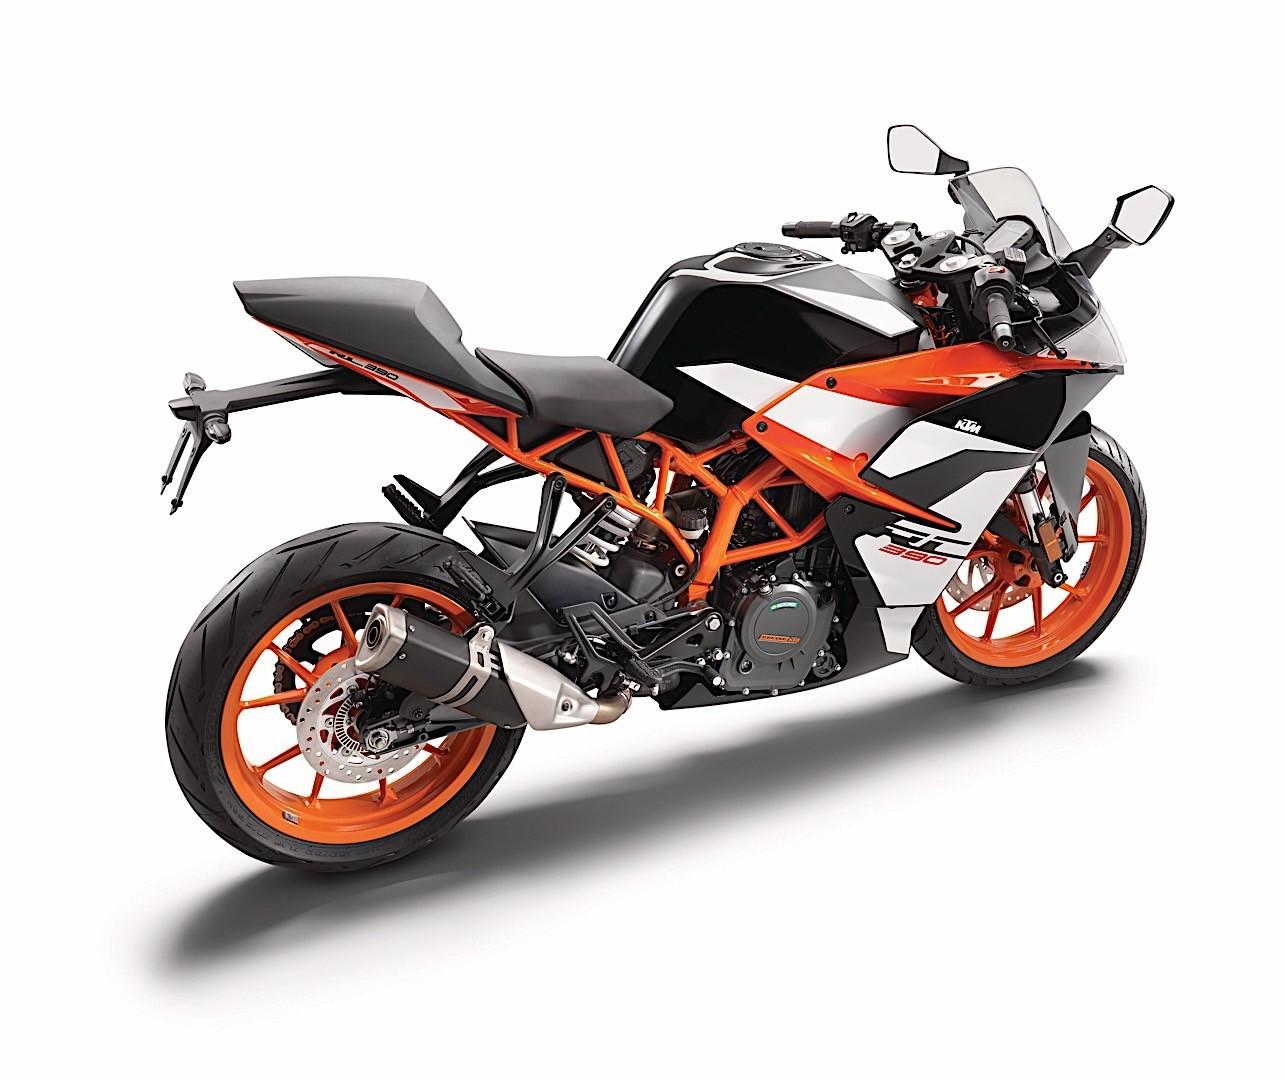 2017 ktm rc 390 major facelift calls to aspiring moto gp racers autoevolution. Black Bedroom Furniture Sets. Home Design Ideas